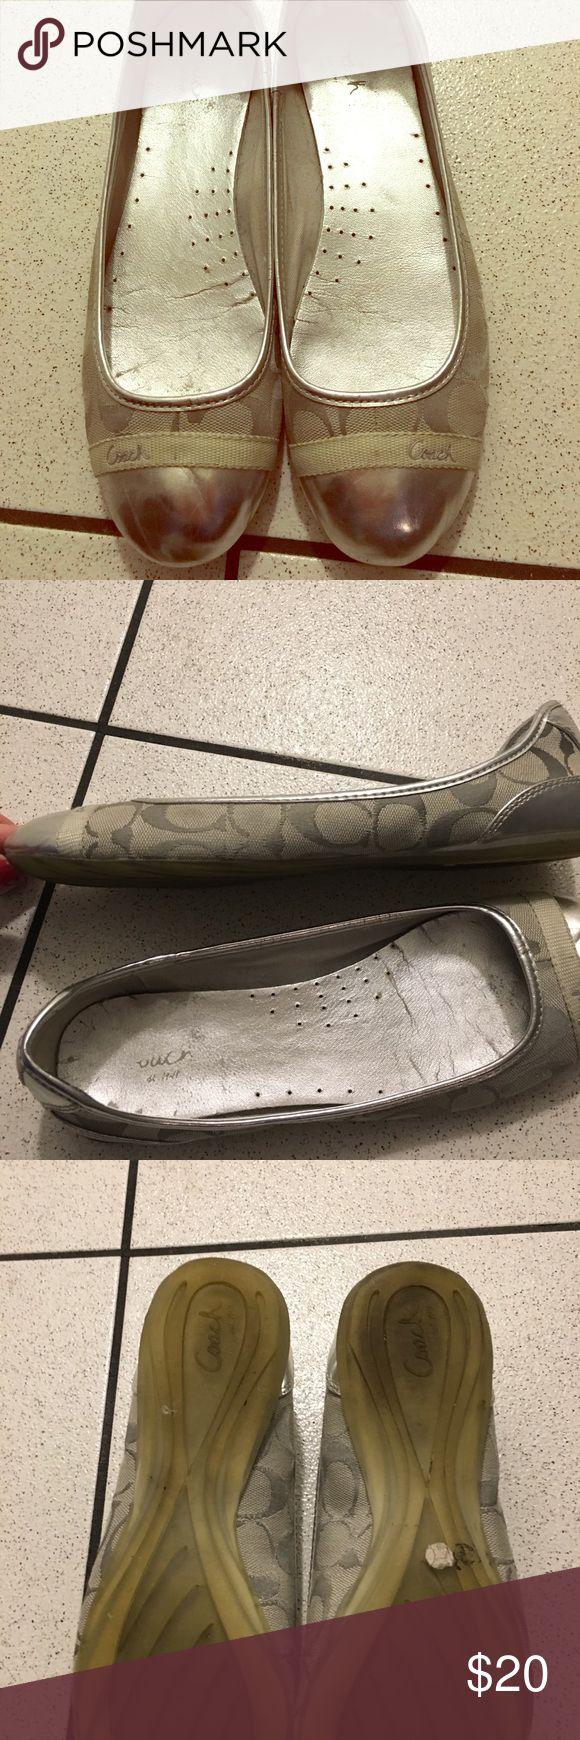 Coach flats Grey Coach flats. Normal wear & tear. Smoke free pet free home. Coach Shoes Flats & Loafers